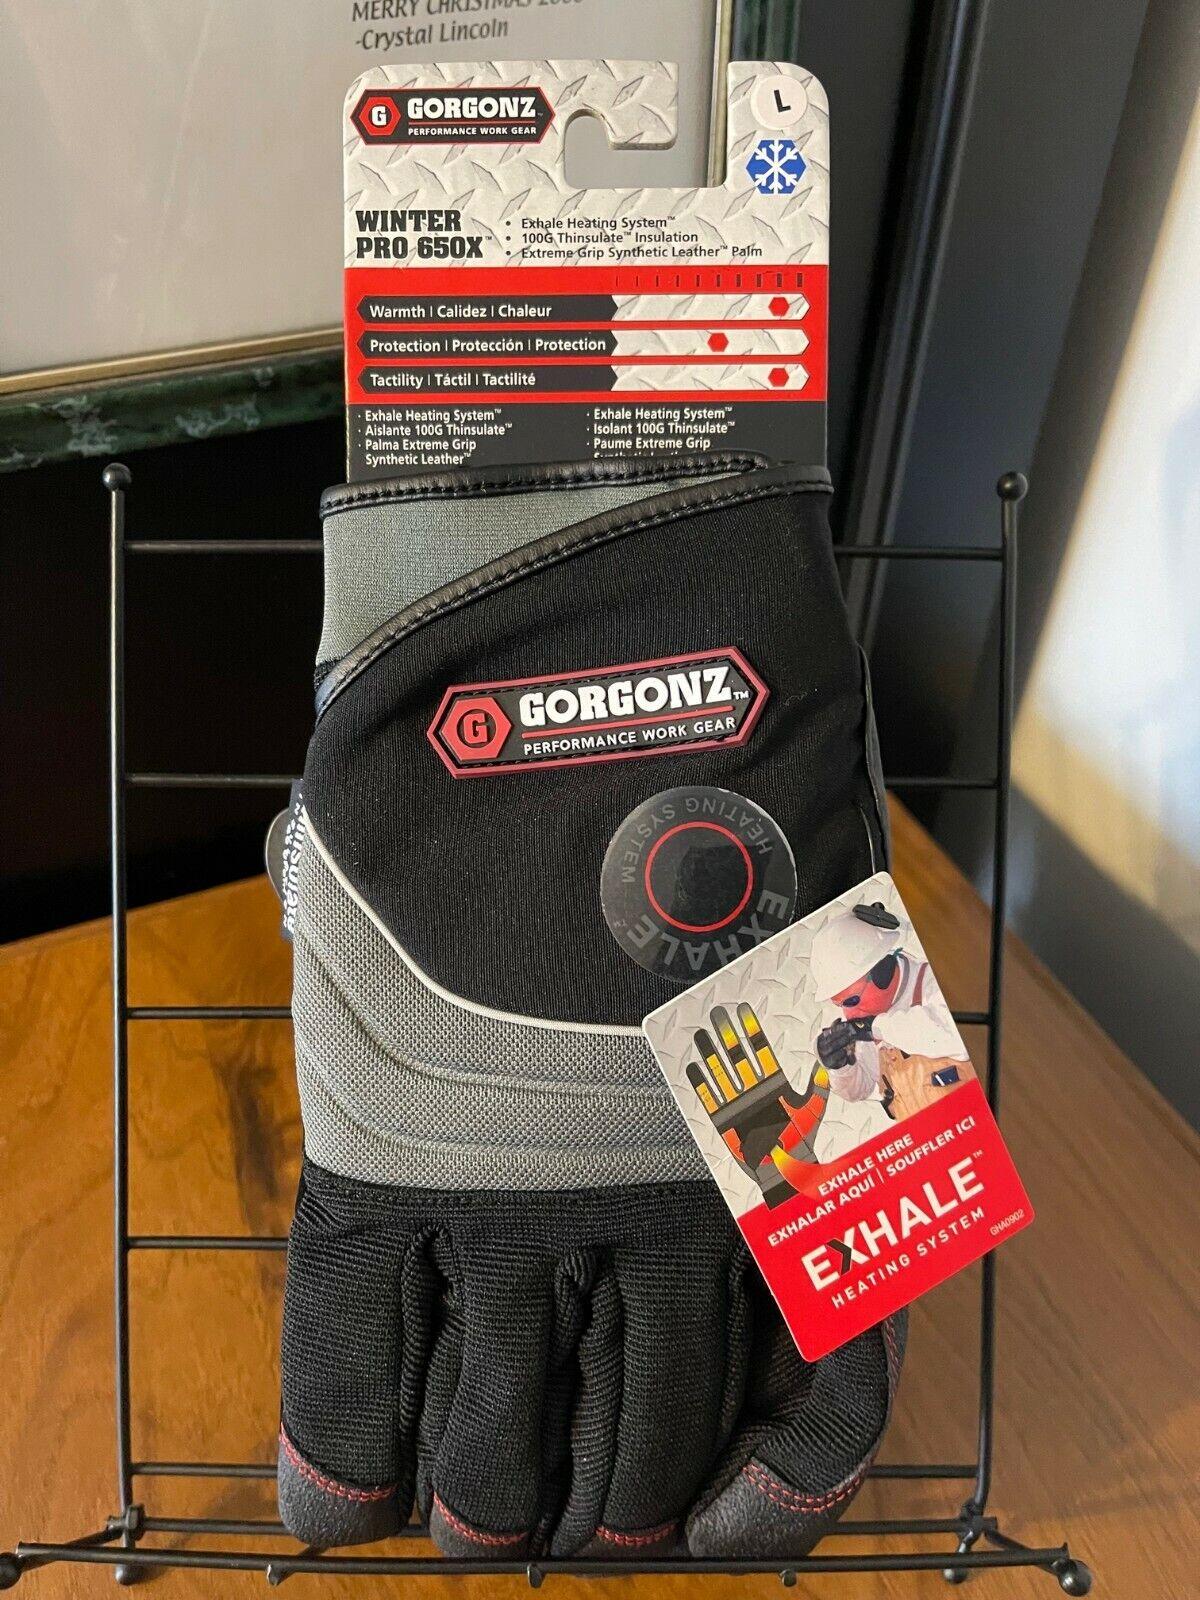 GORGONZ Men's Extreme Grip-100G Thinsulate-WINTER PRO 650X GLOVES - Size L -NEW